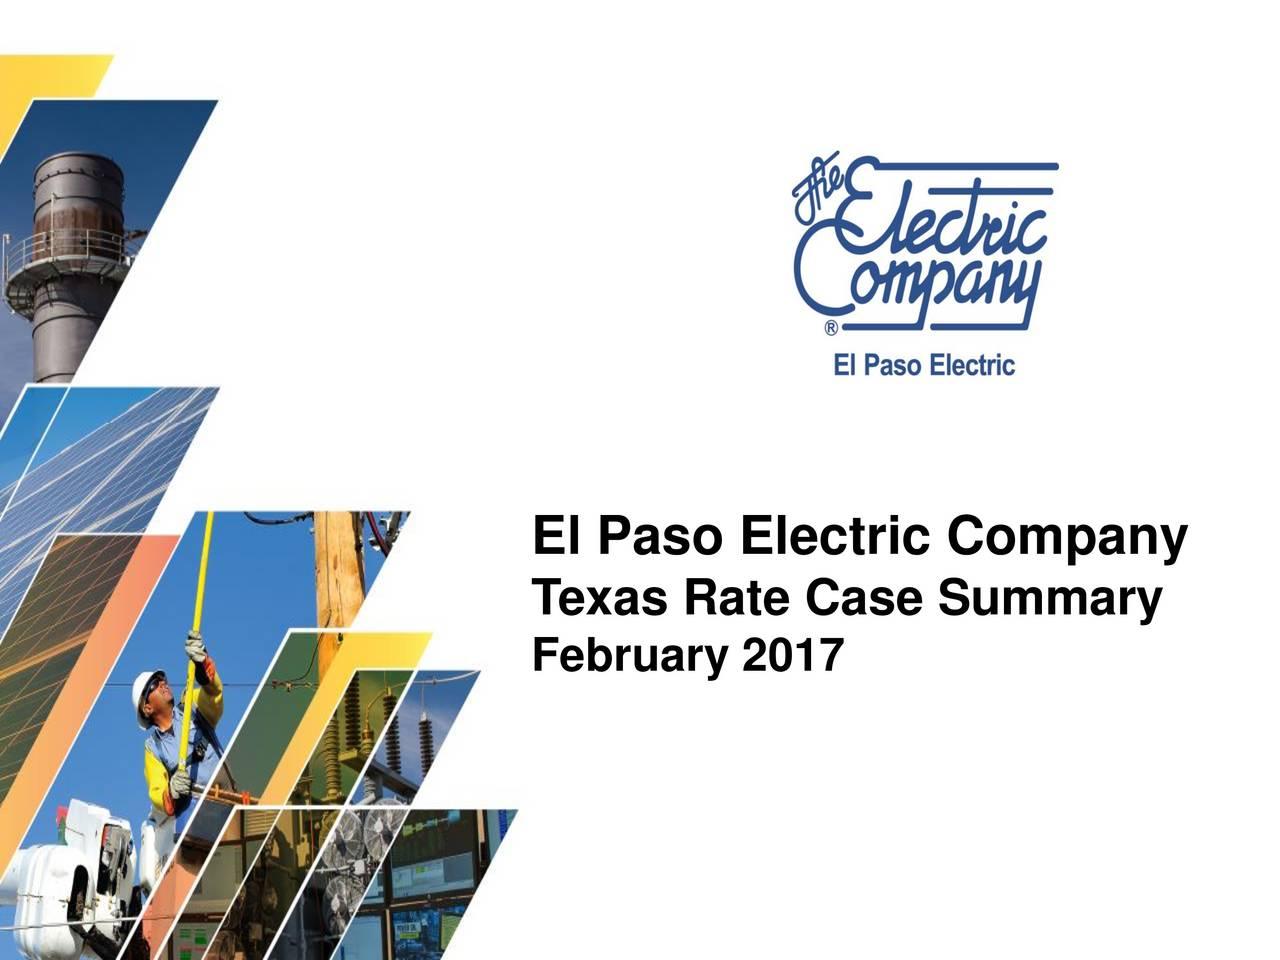 Texas Rate Case Summary February 2017